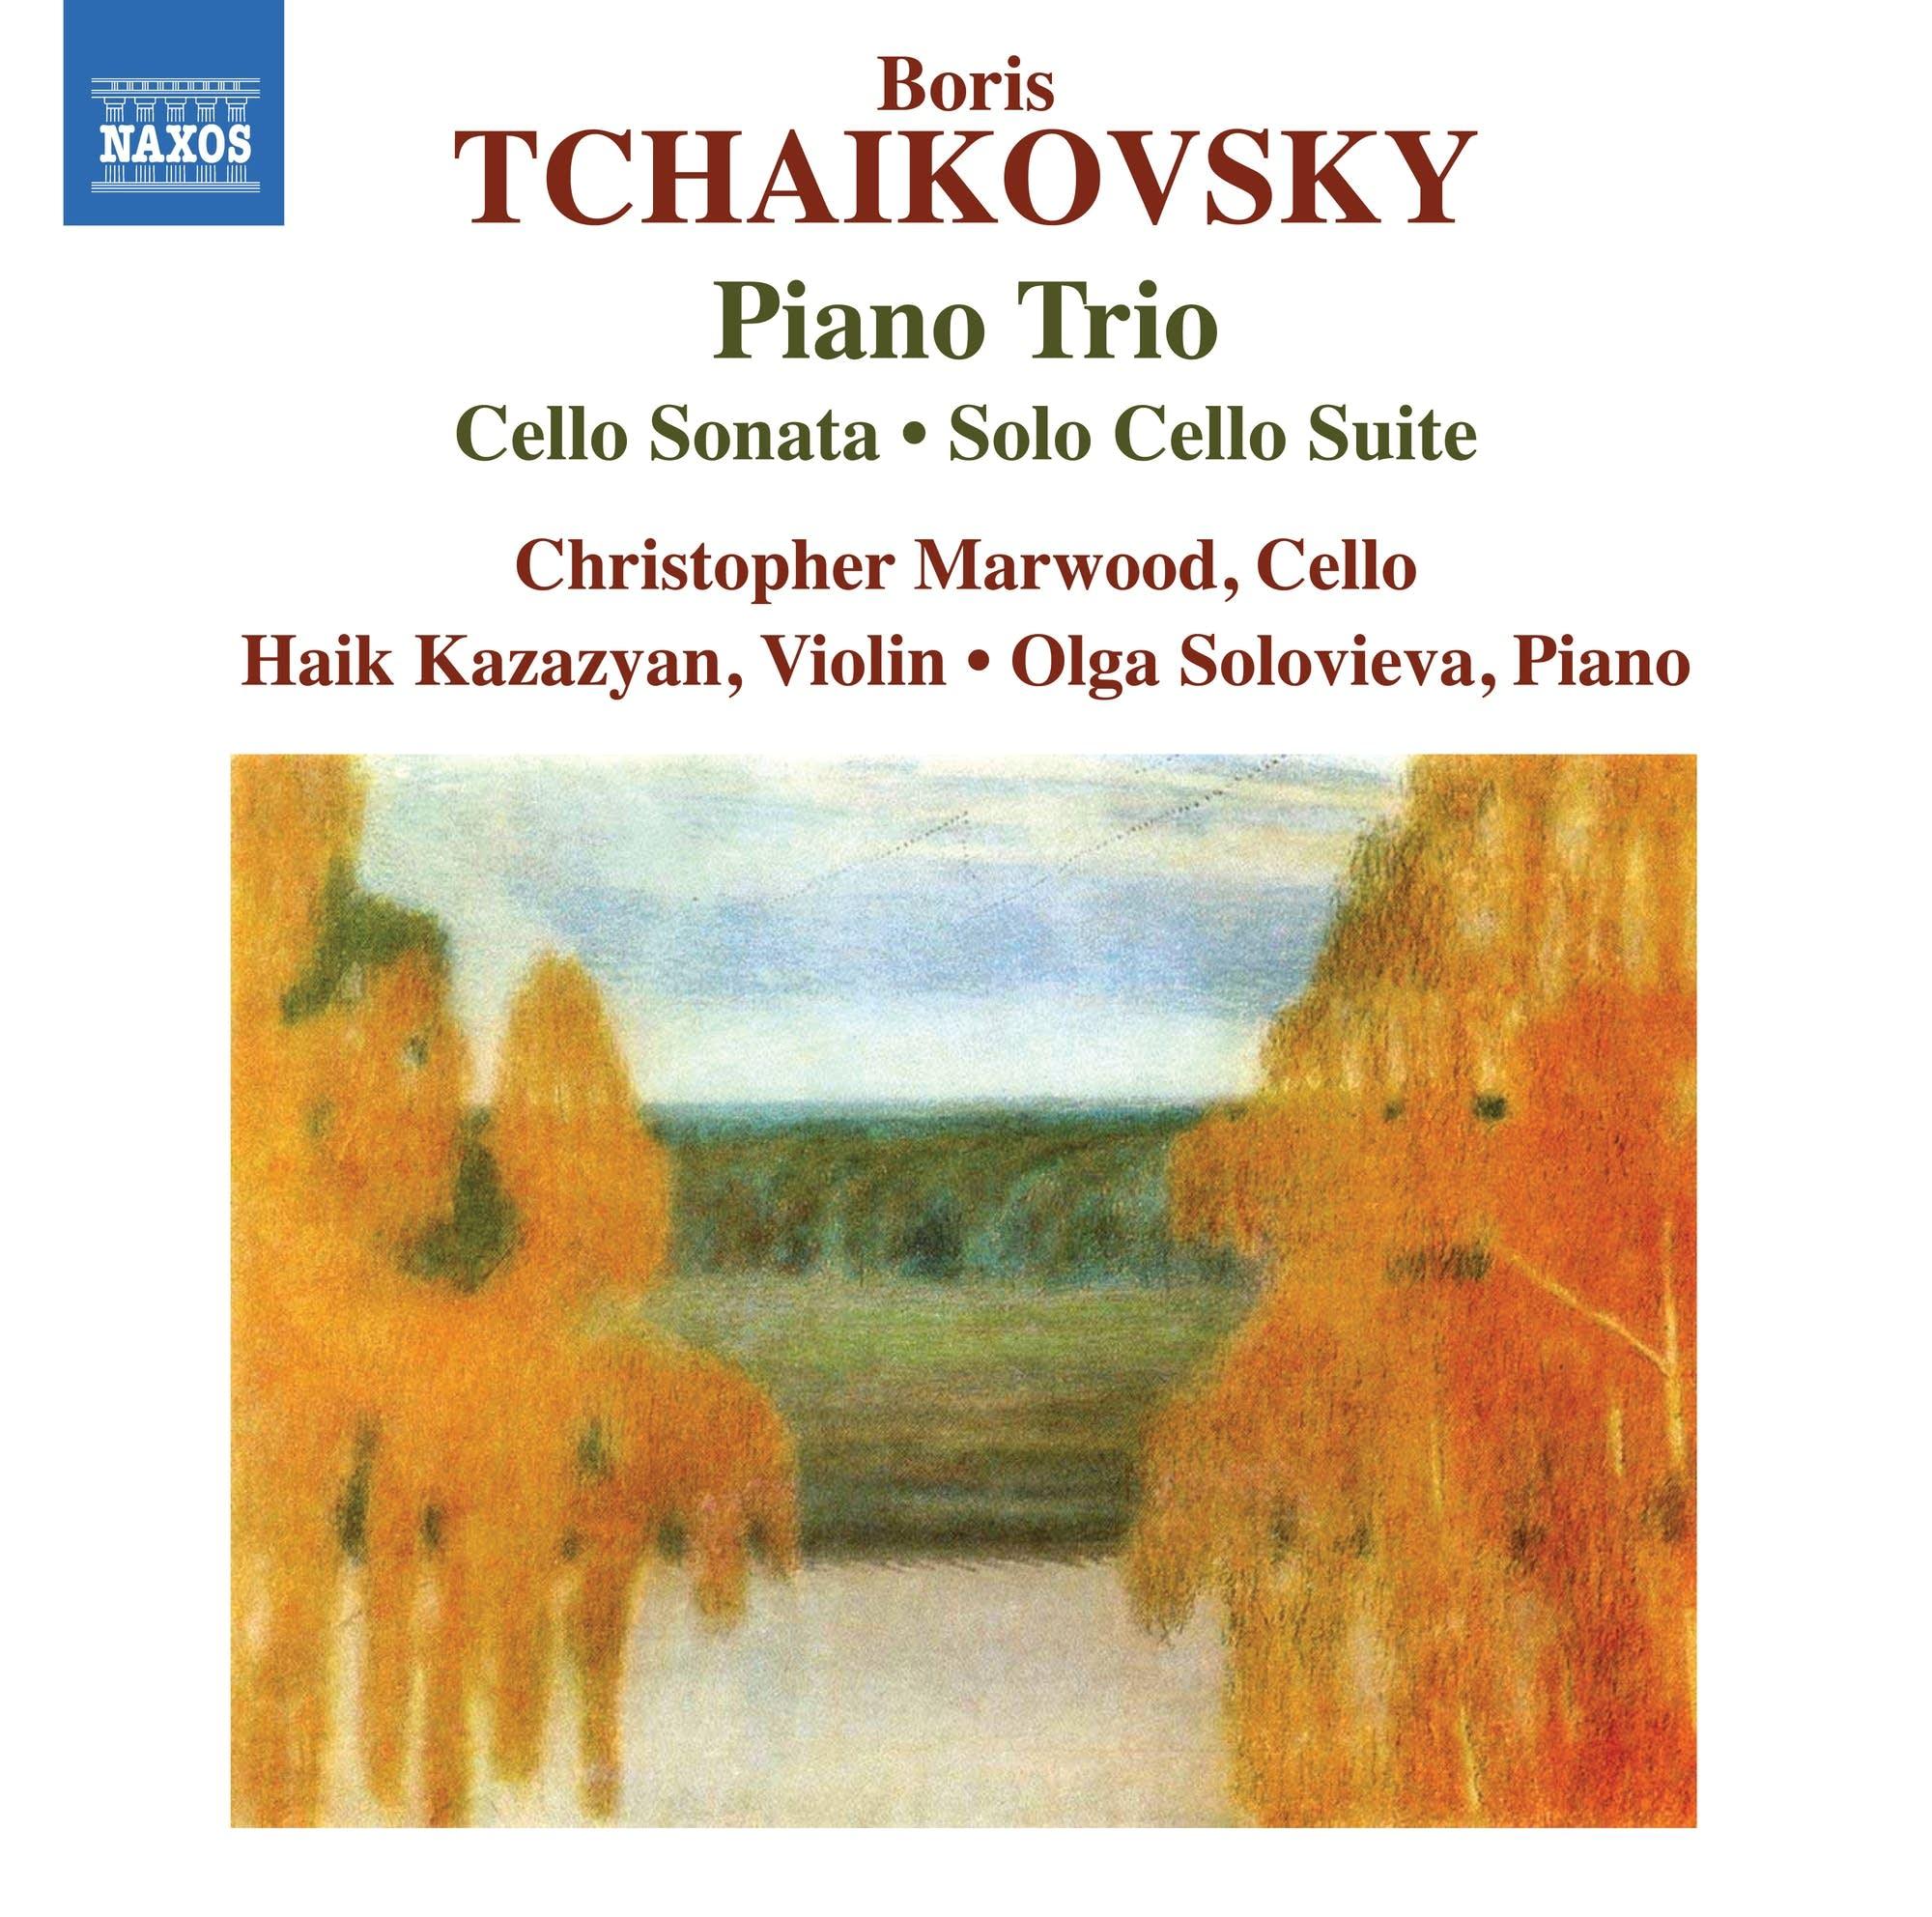 Boris Tchaikovsky - Cello Sonata: I. Allegro non troppo